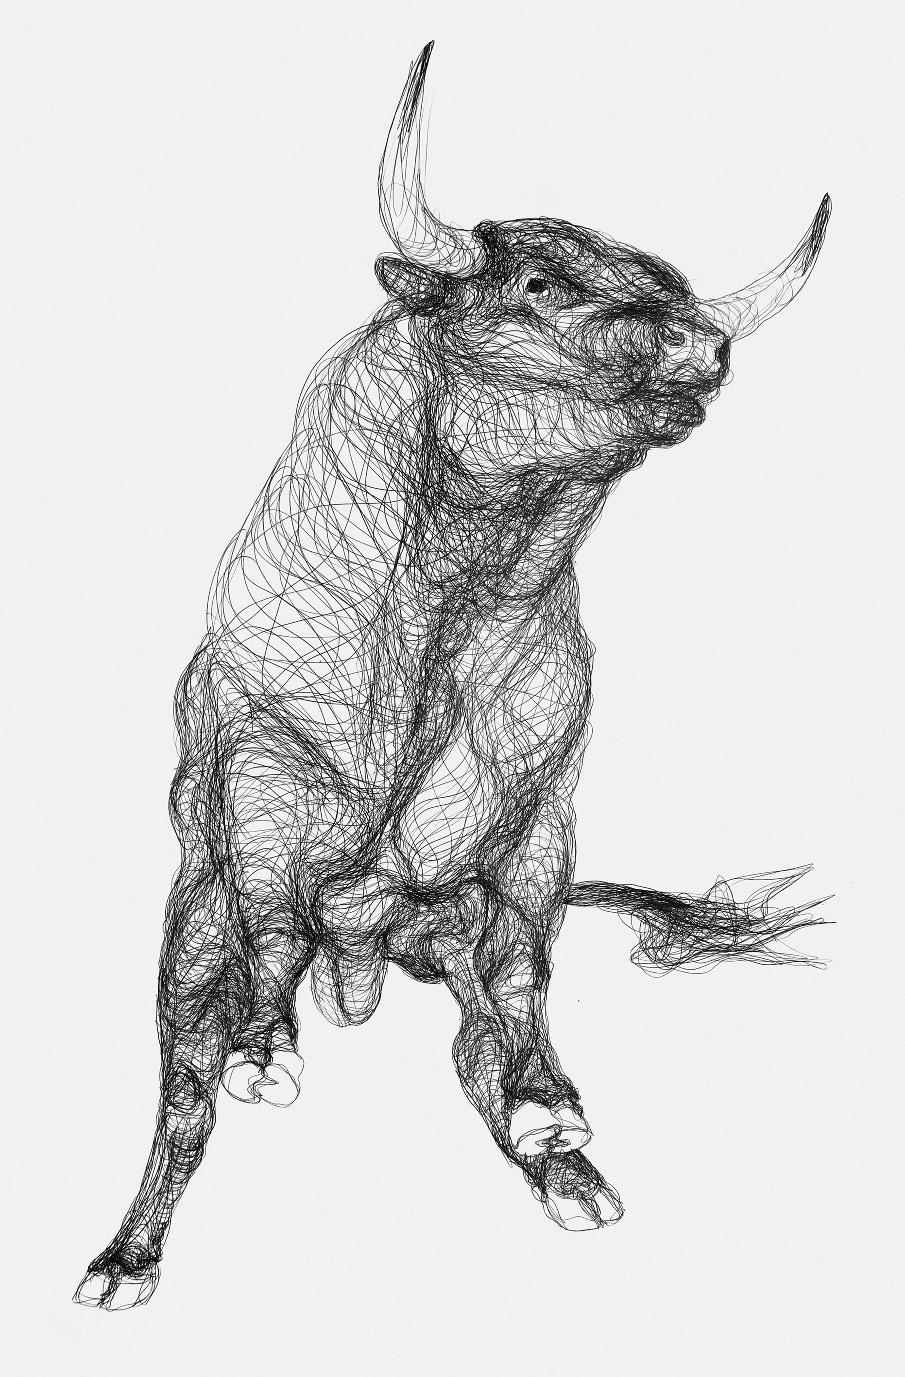 3400mm x 2500mm  Graphite drawing on paper Taurus Bull Drawing